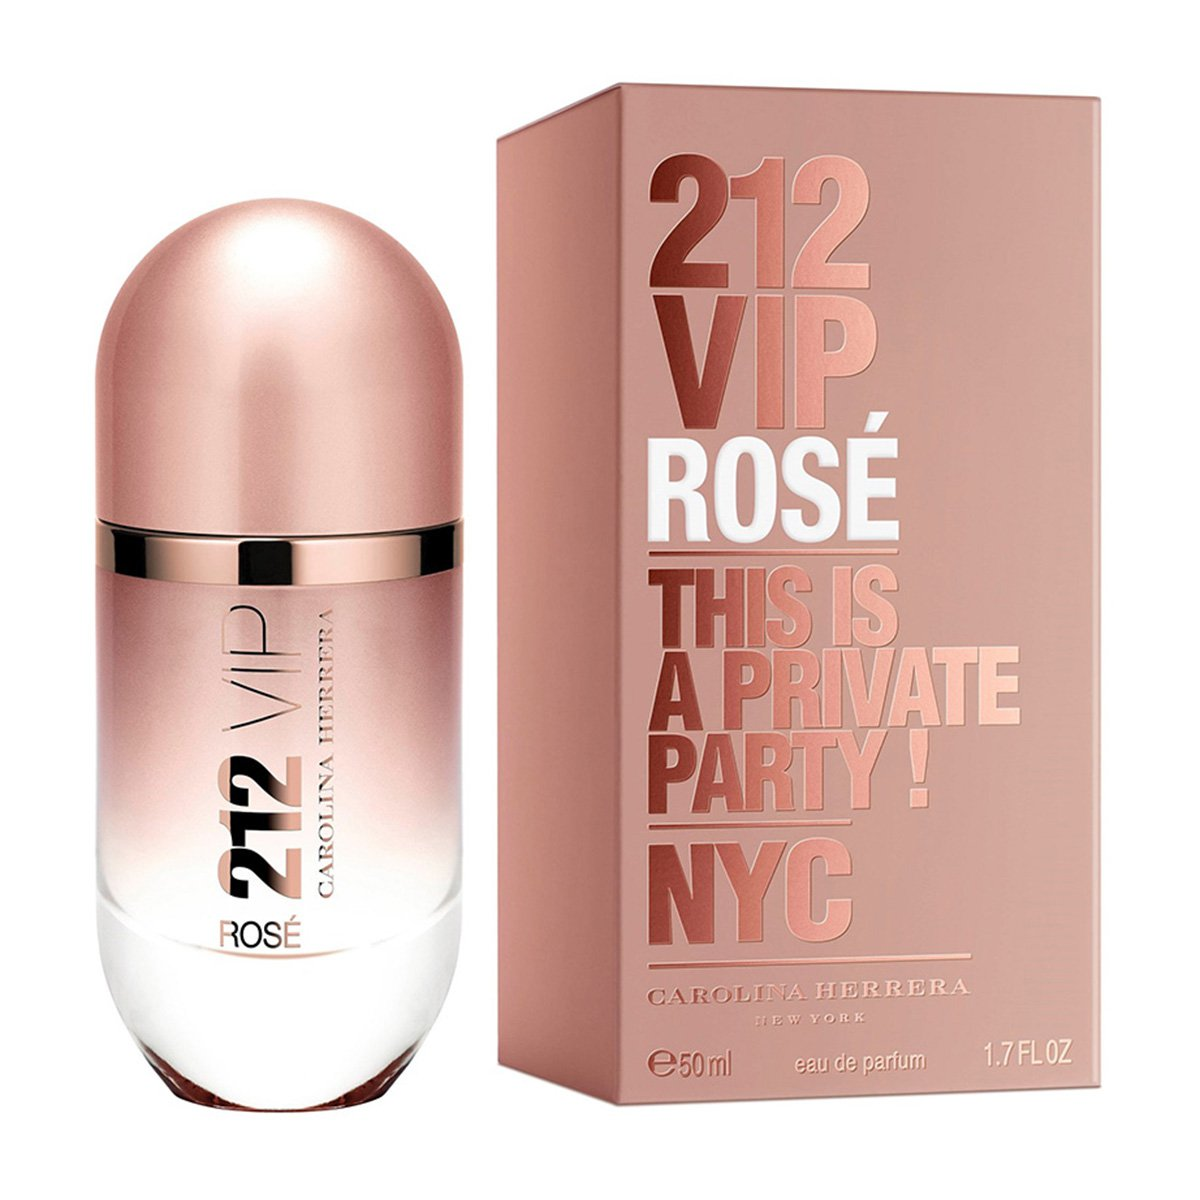 Perfume Feminino 212 VIP Rosé Carolina Herrera Eau de Parfum 50ml - 1